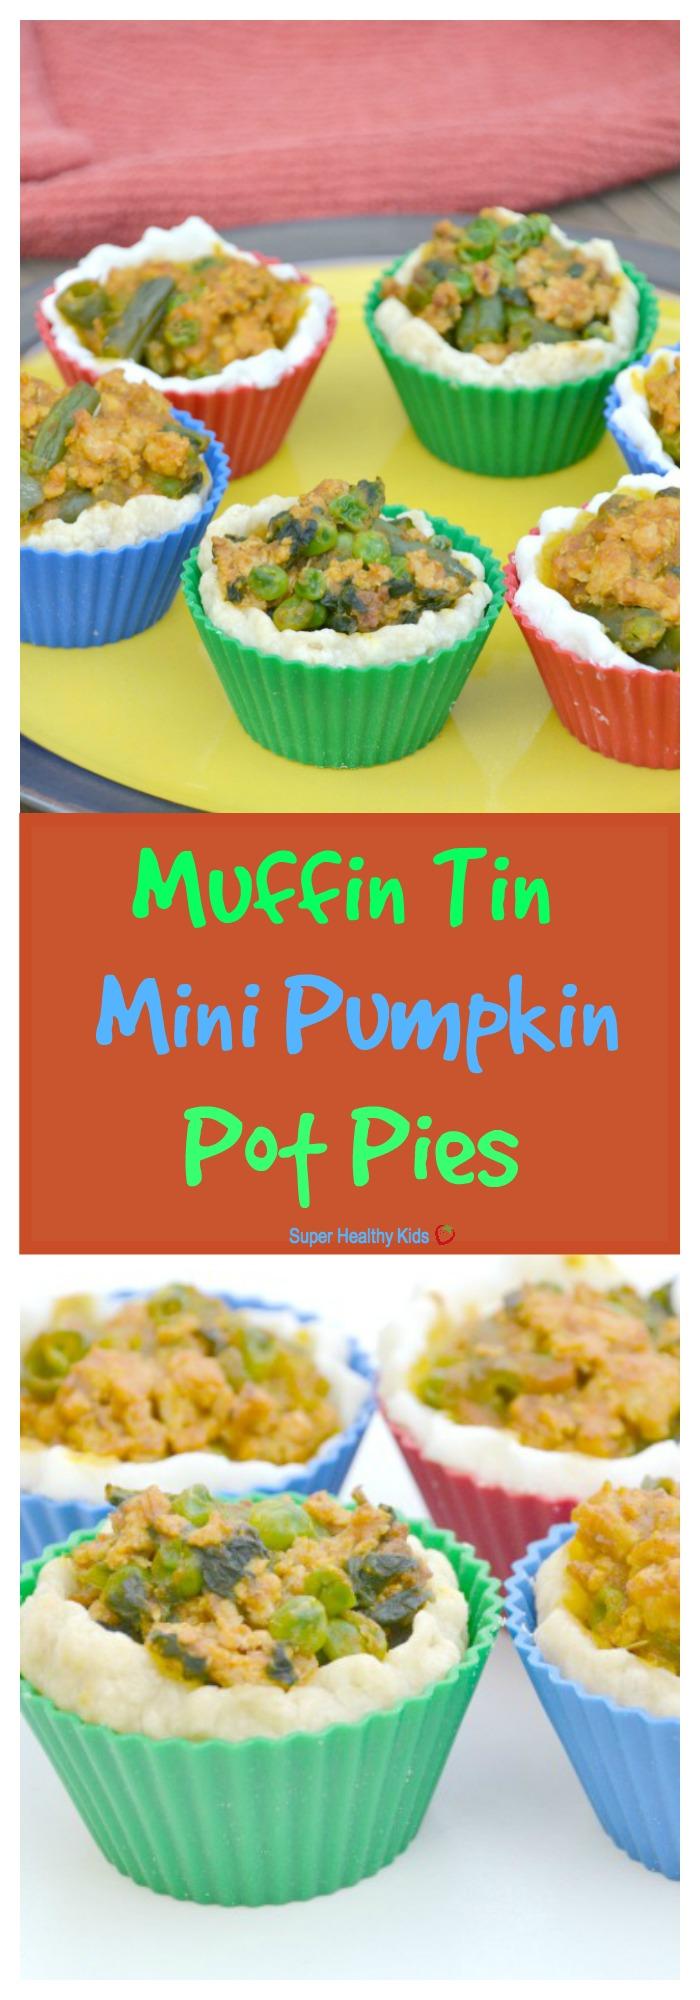 FOOD - Muffin Tin Mini Pumpkin Pot Pies. Use Thanksgiving leftovers to make this quick weeknight meal! http://www.superhealthykids.com/muffin-tin-mini-pumpkin-pot-pies/